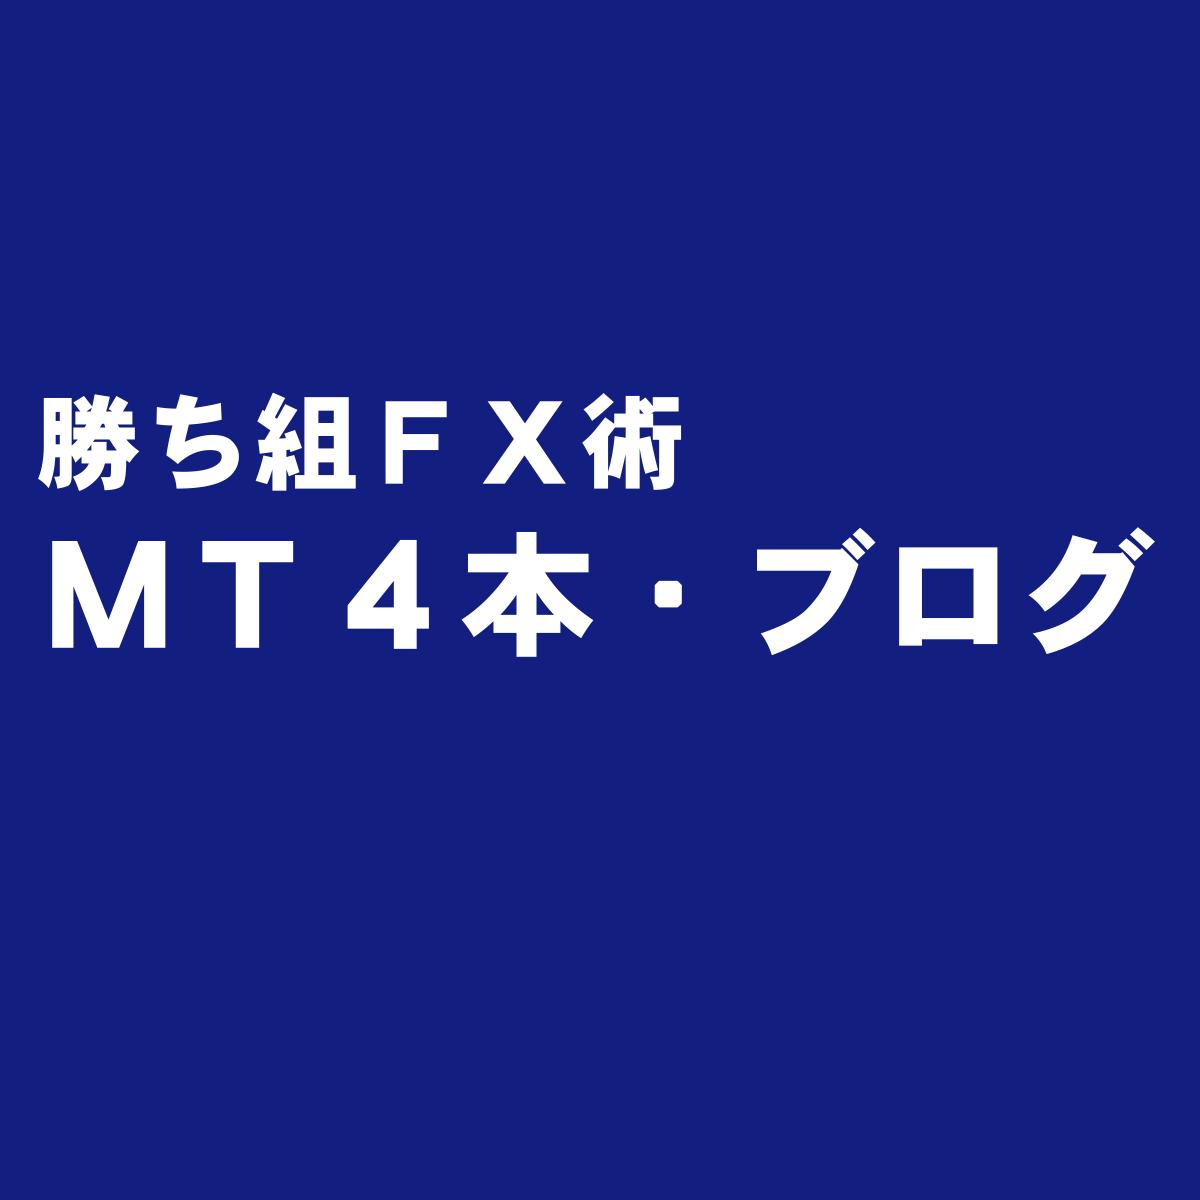 MT4本やブログ